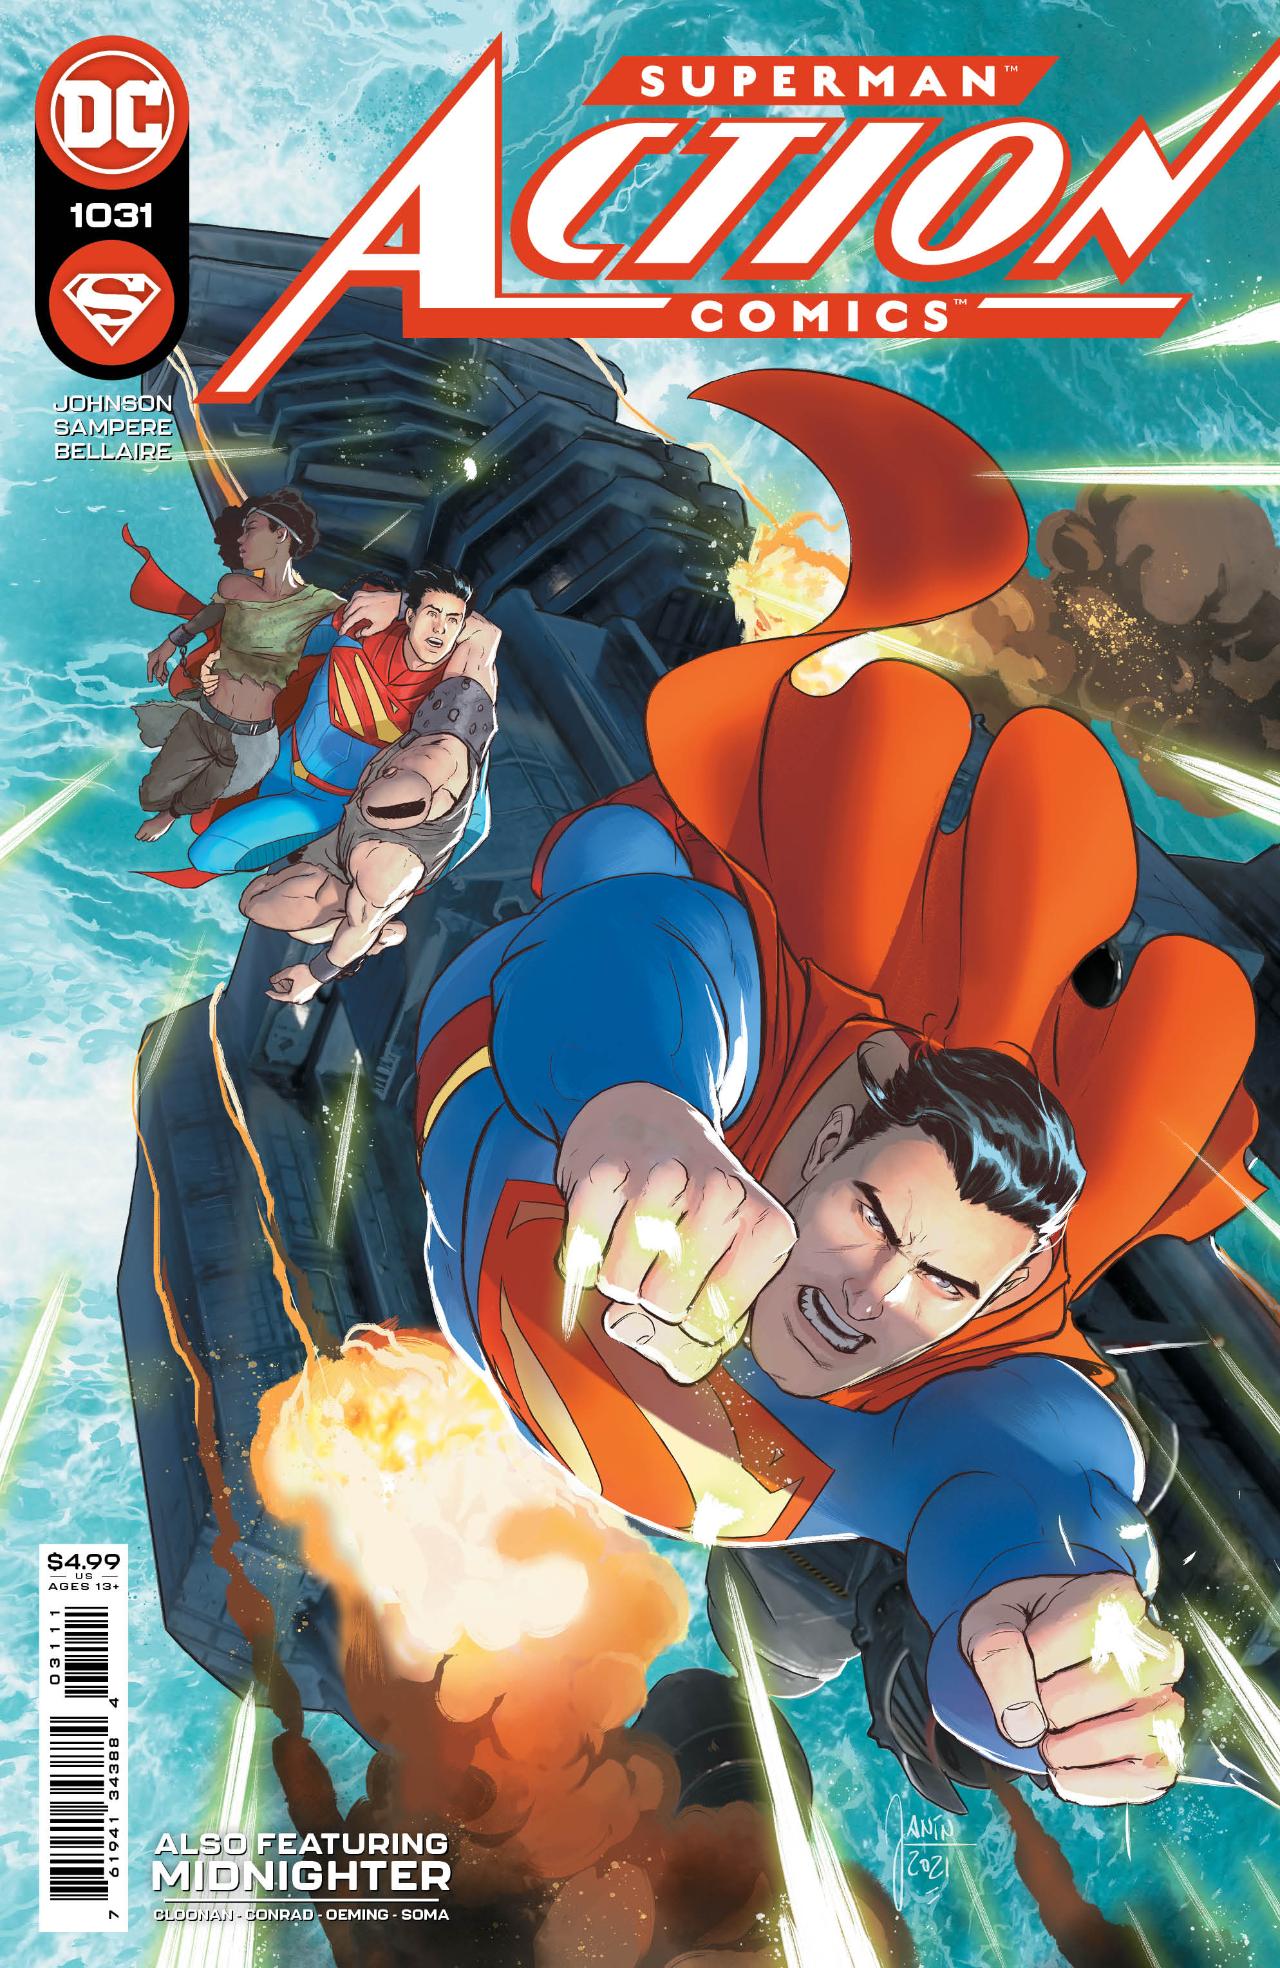 Action Comics # 1031